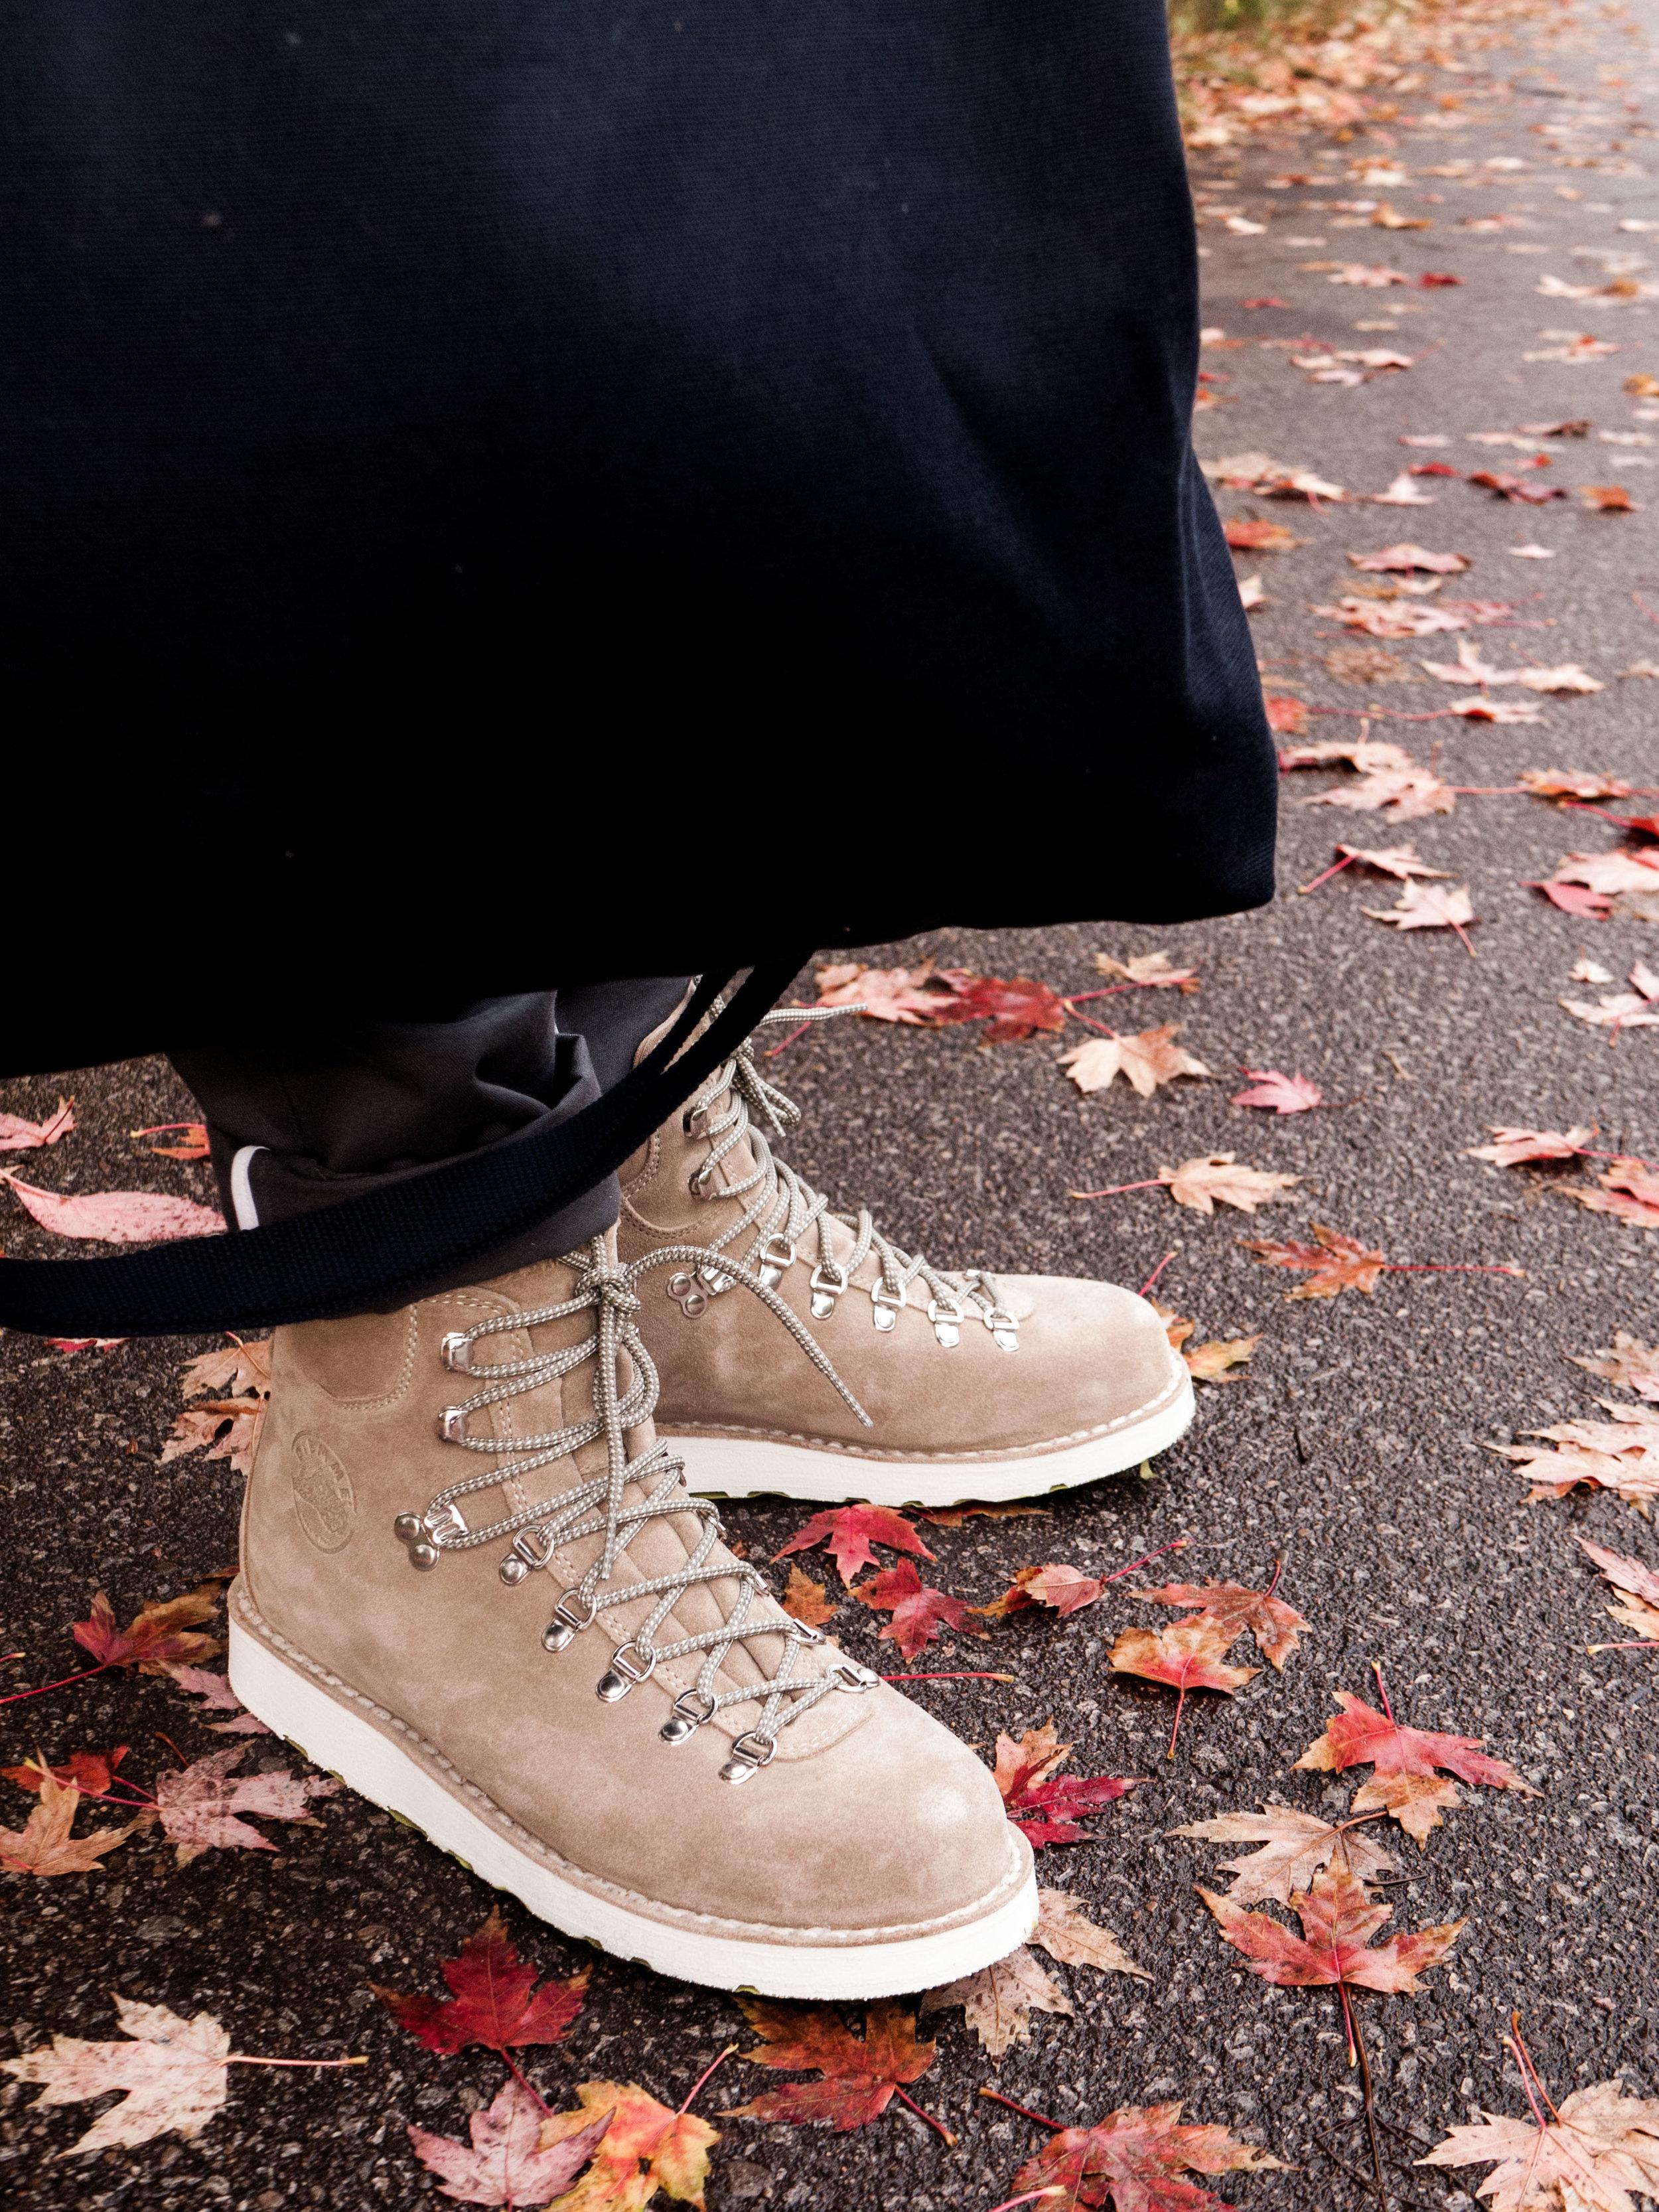 005    18 Waits  Overshirt , Shirt, Bandana & Trousers     Diemme  Boots     WANT Les Essentiels  Tote